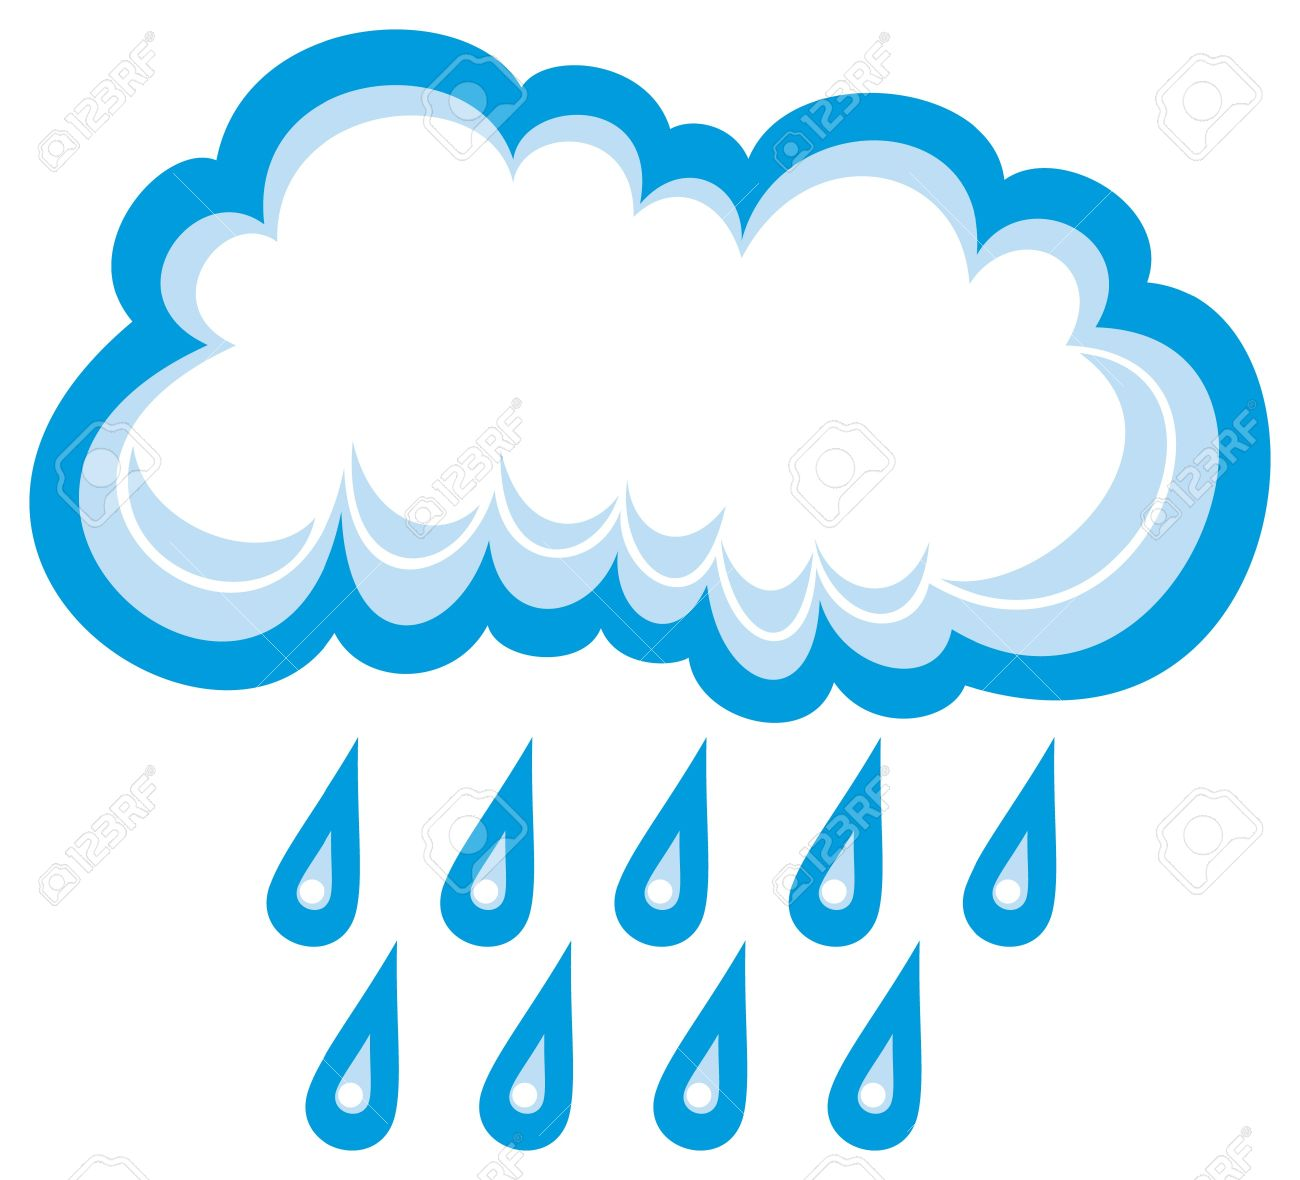 Cloud And Rain White Cloud, Cloud Icon, Cloud And Rain Drops.